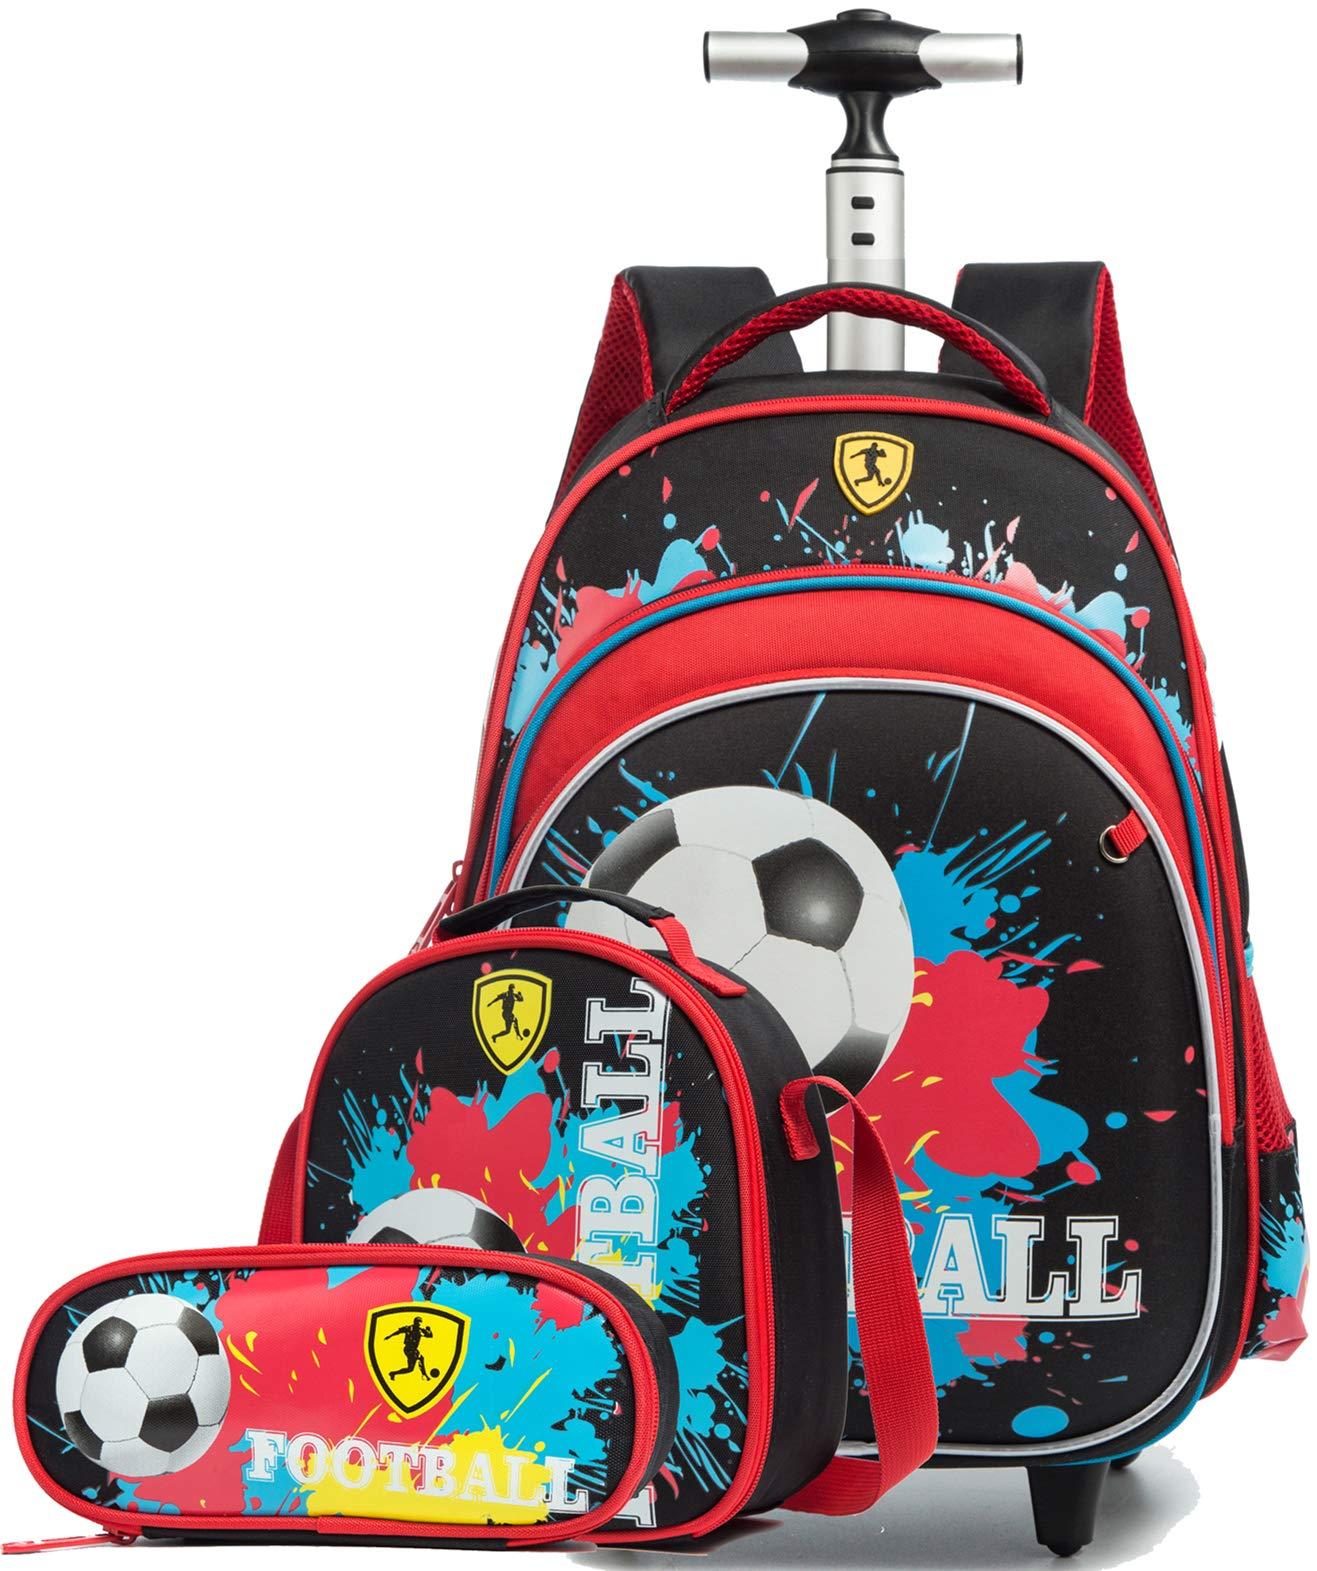 Meetbelify Unicorn Backpacks Backpack Football